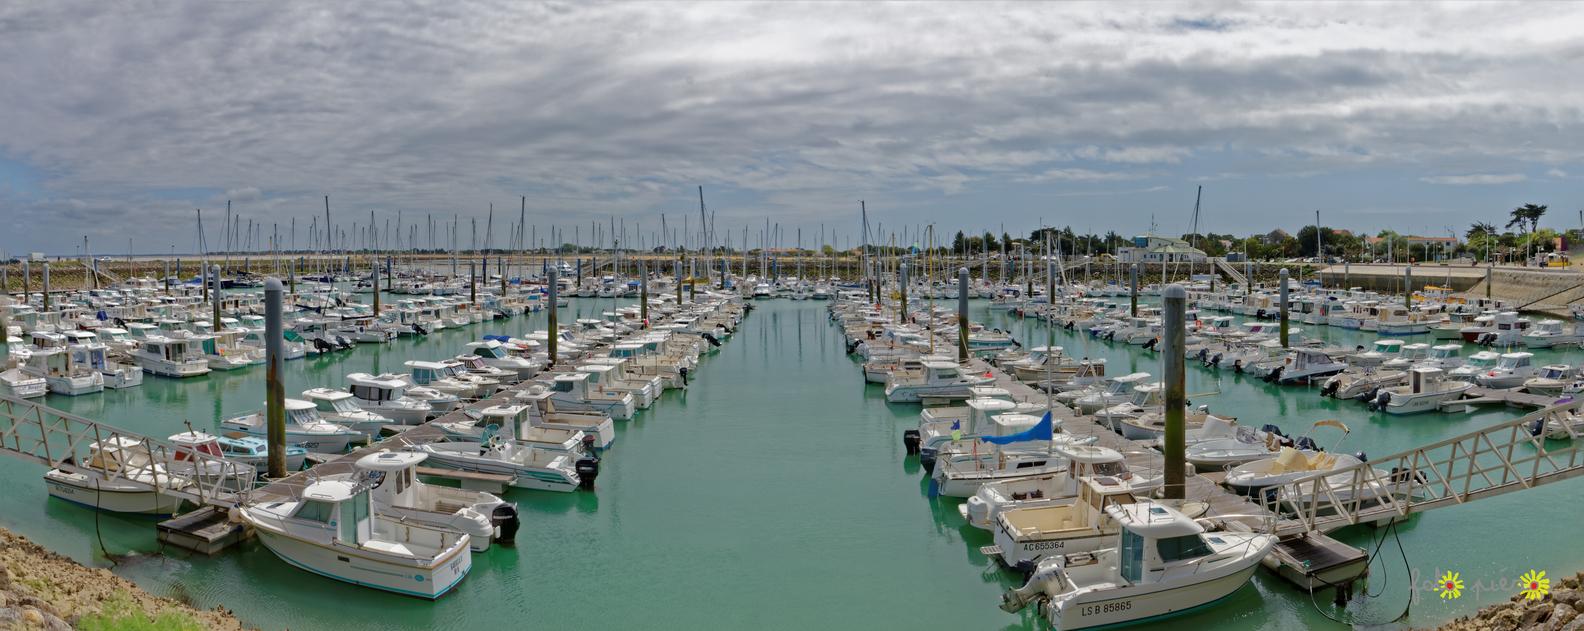 Saint Denis d'Oléron - Charente maritime. Mai 2015.